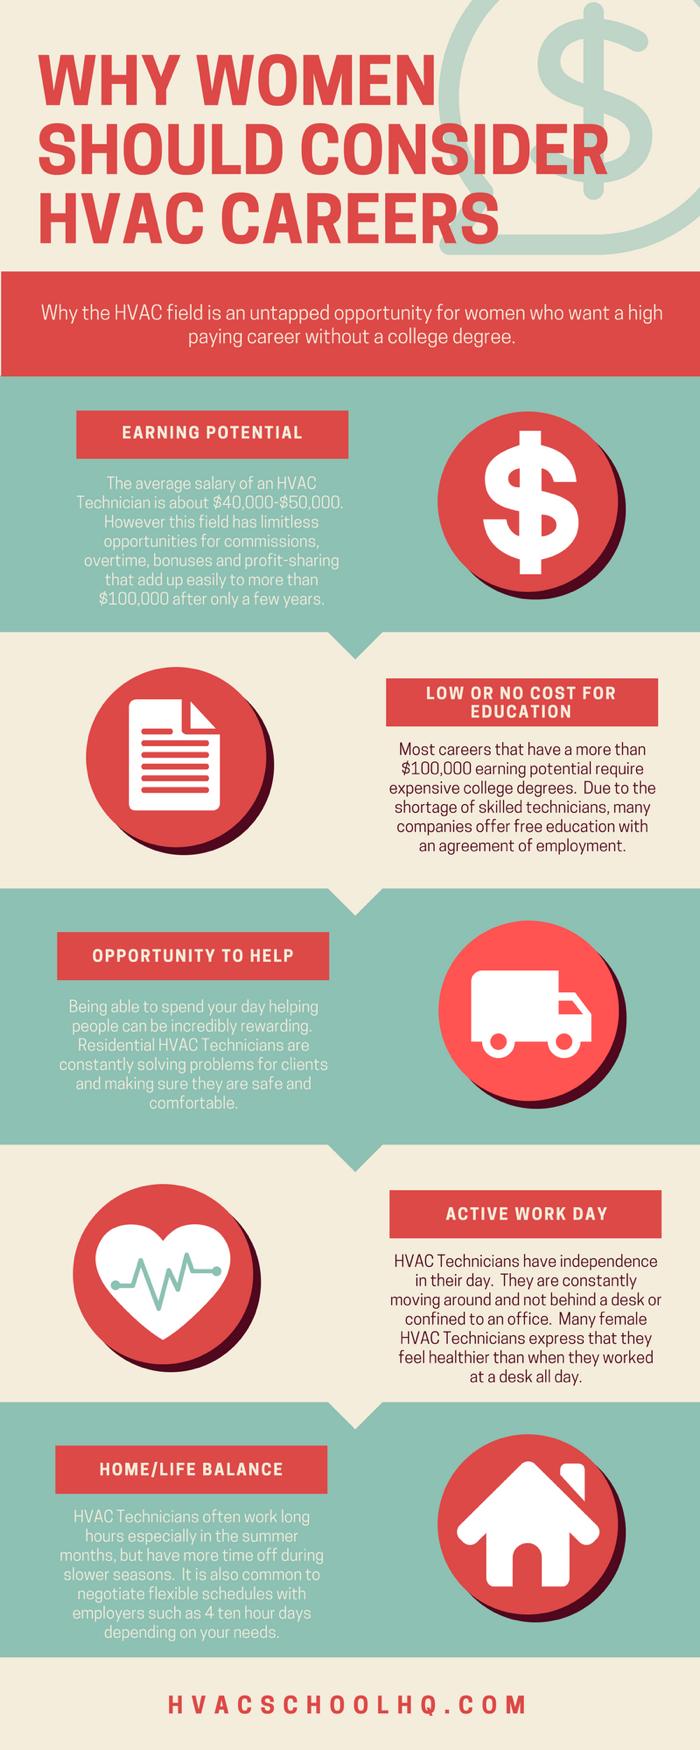 5-reasons-women-should-consider-hvac-career